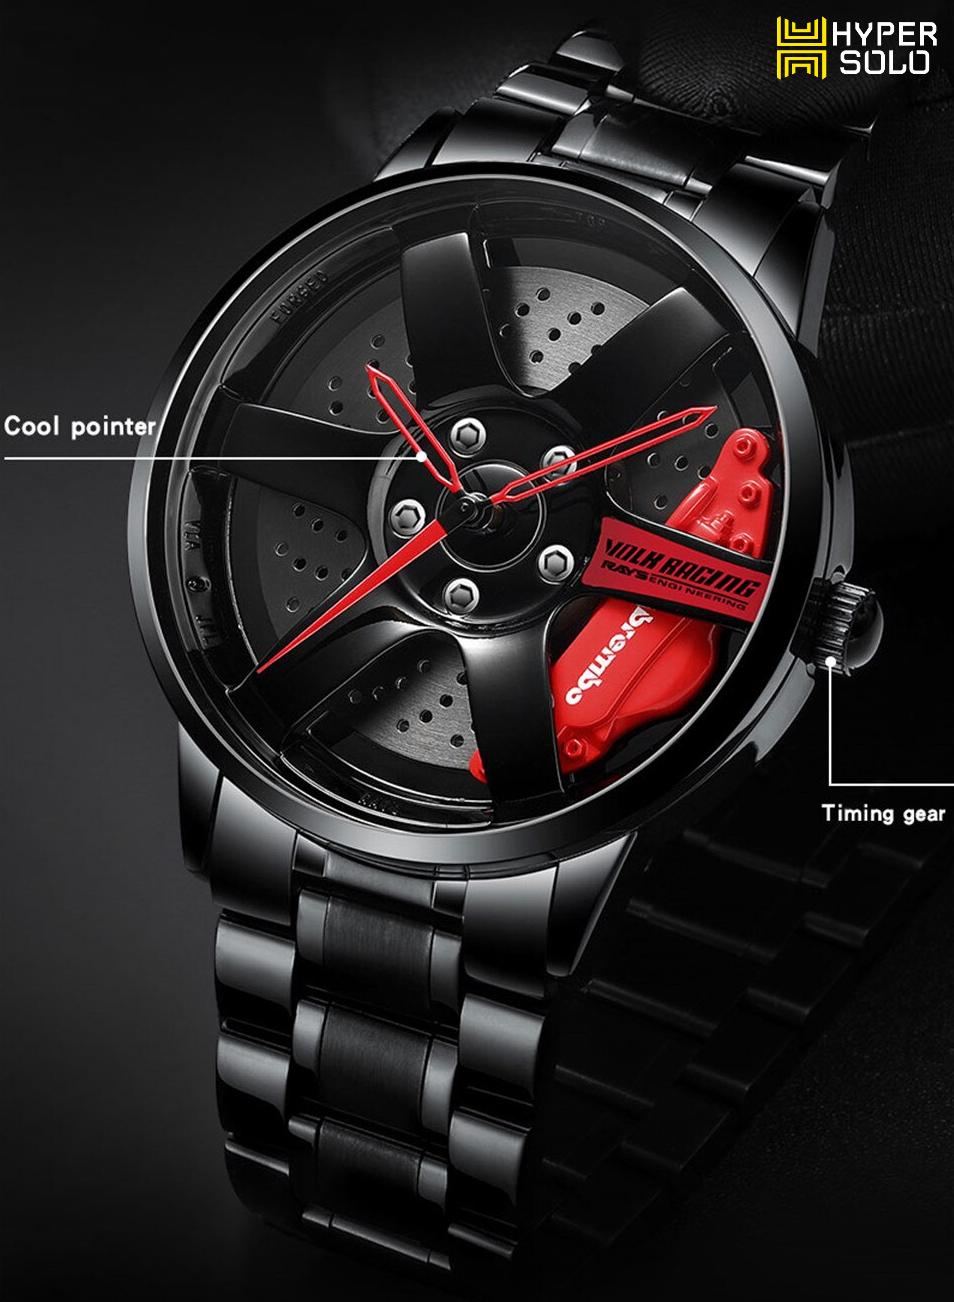 Bugatti RIM Luxury Wrist Watch for Men